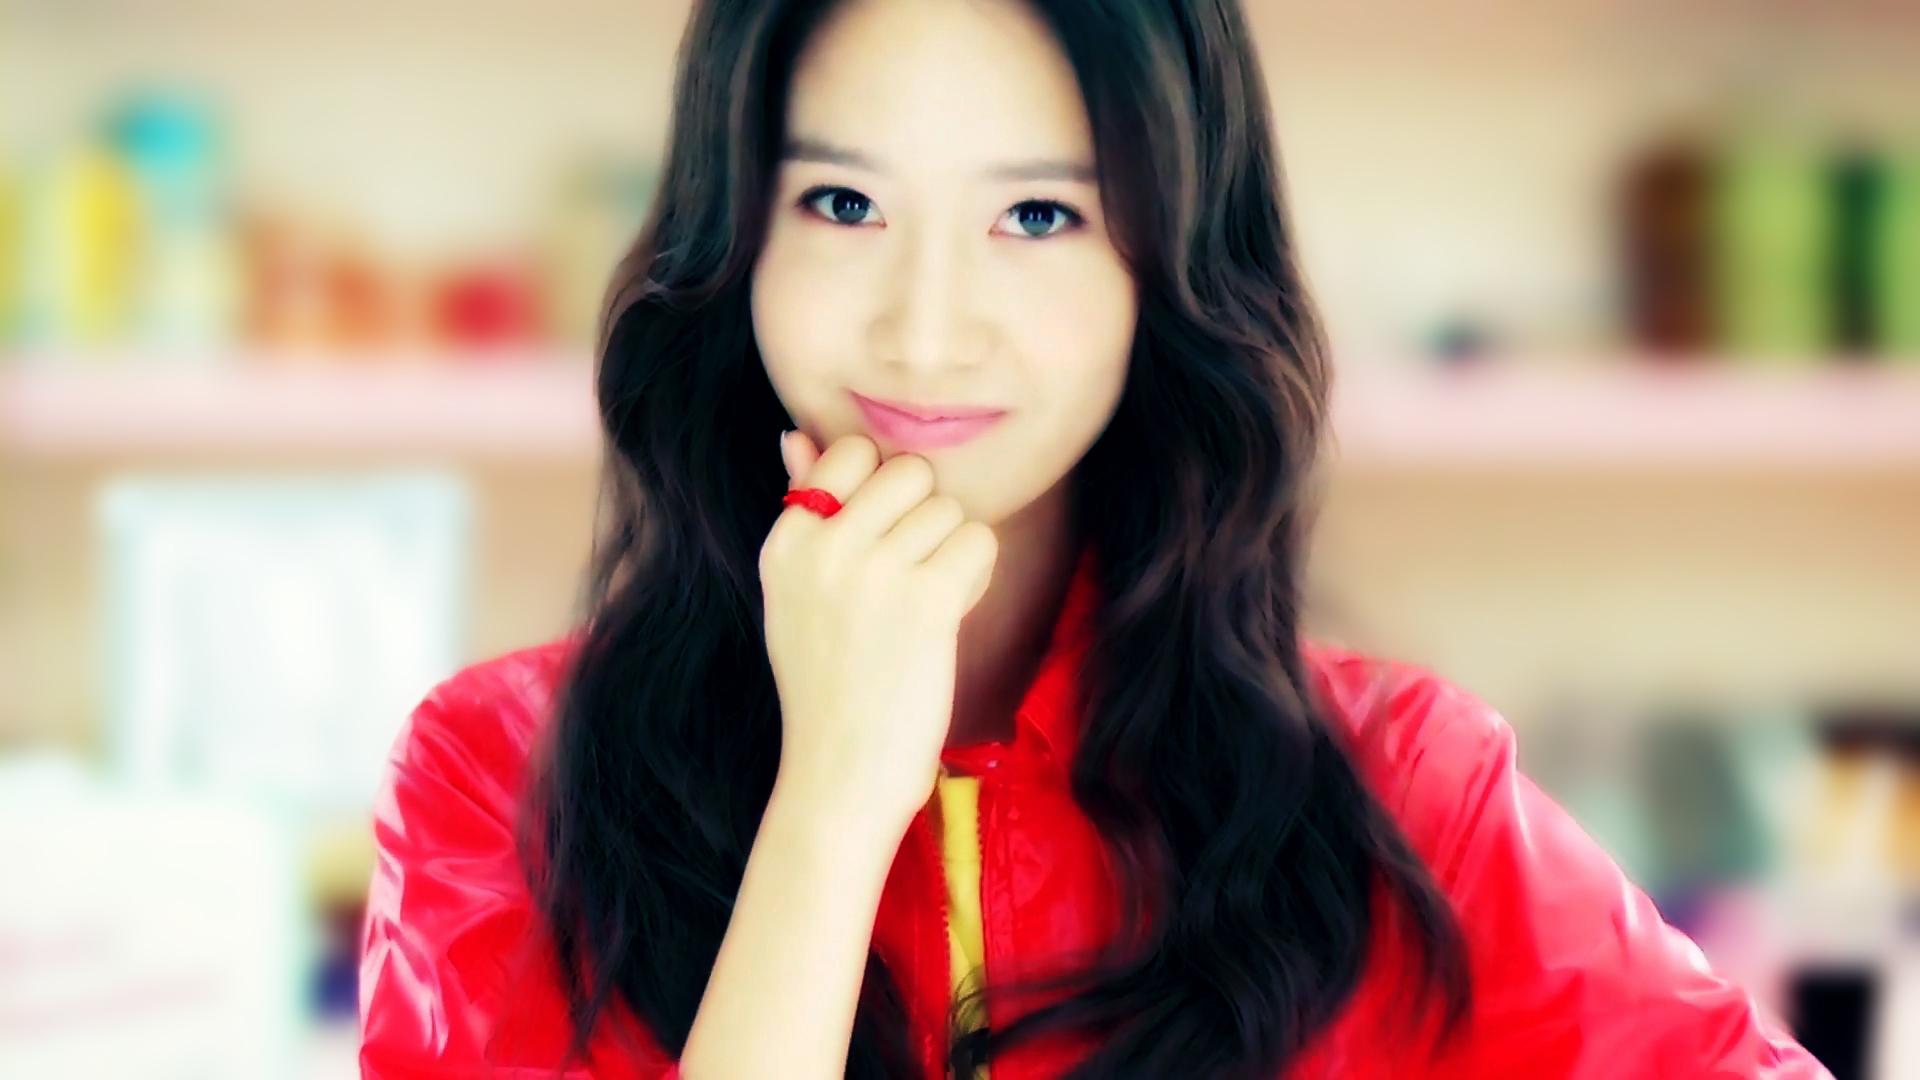 Im Yoona Movie List Ideal official] ♡ lee seung gi ♥ im yoona ♡ yoongi - page 262